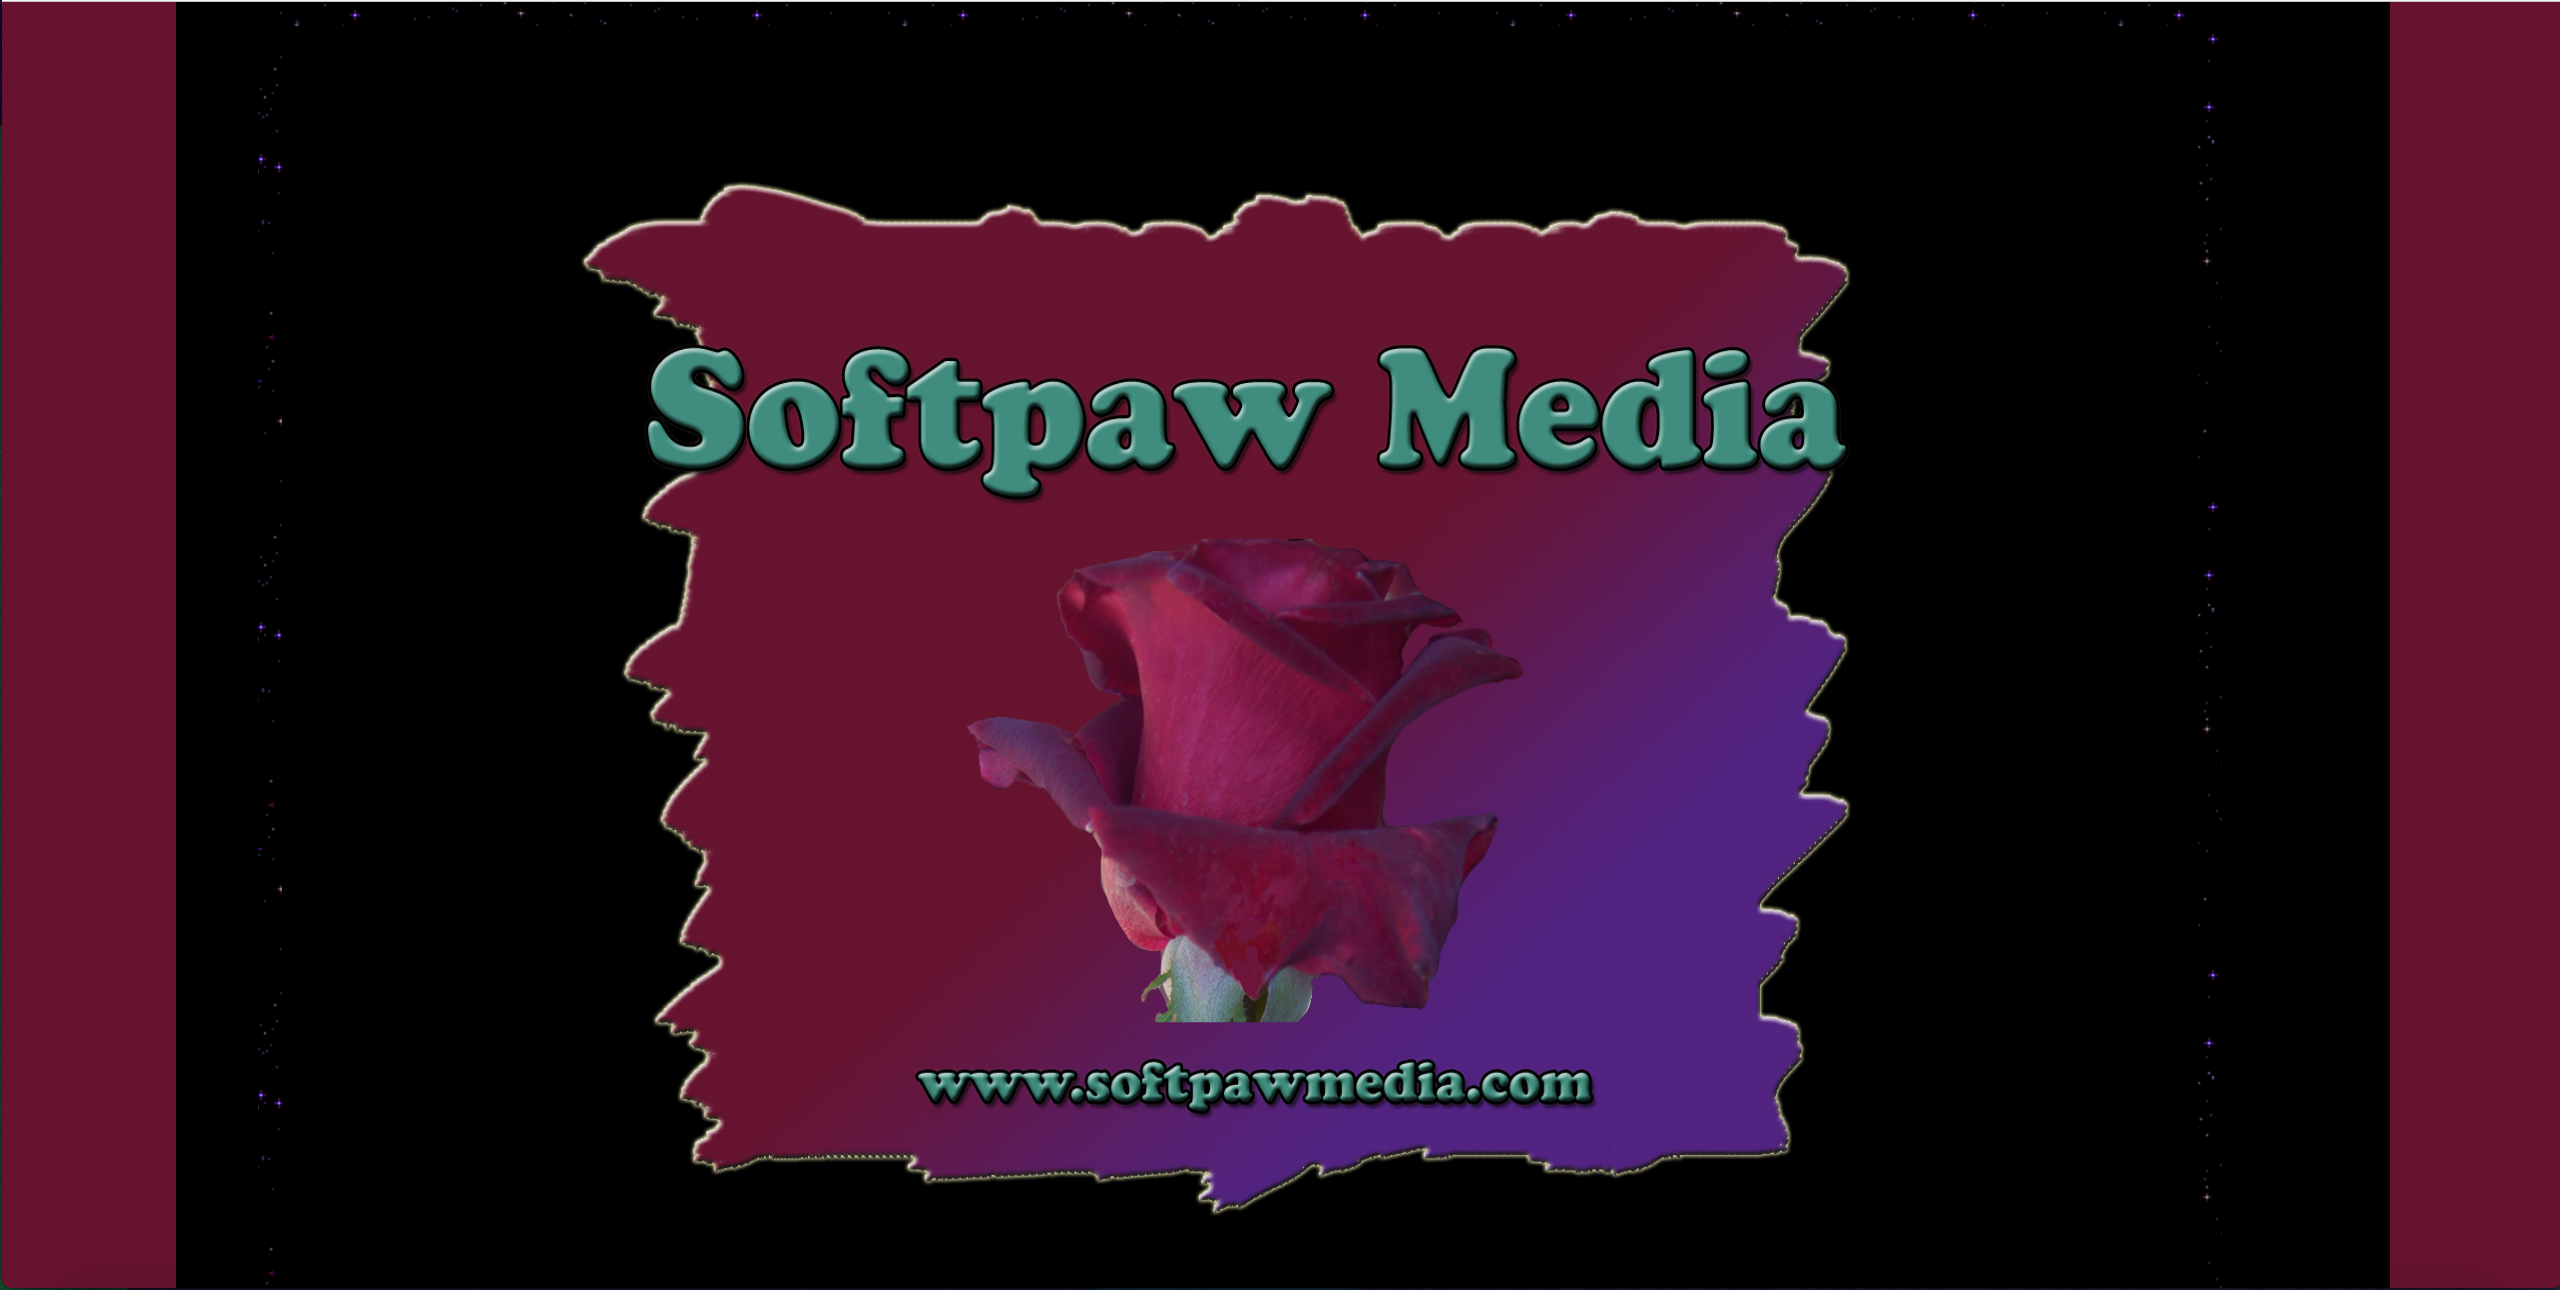 Softpaw Media